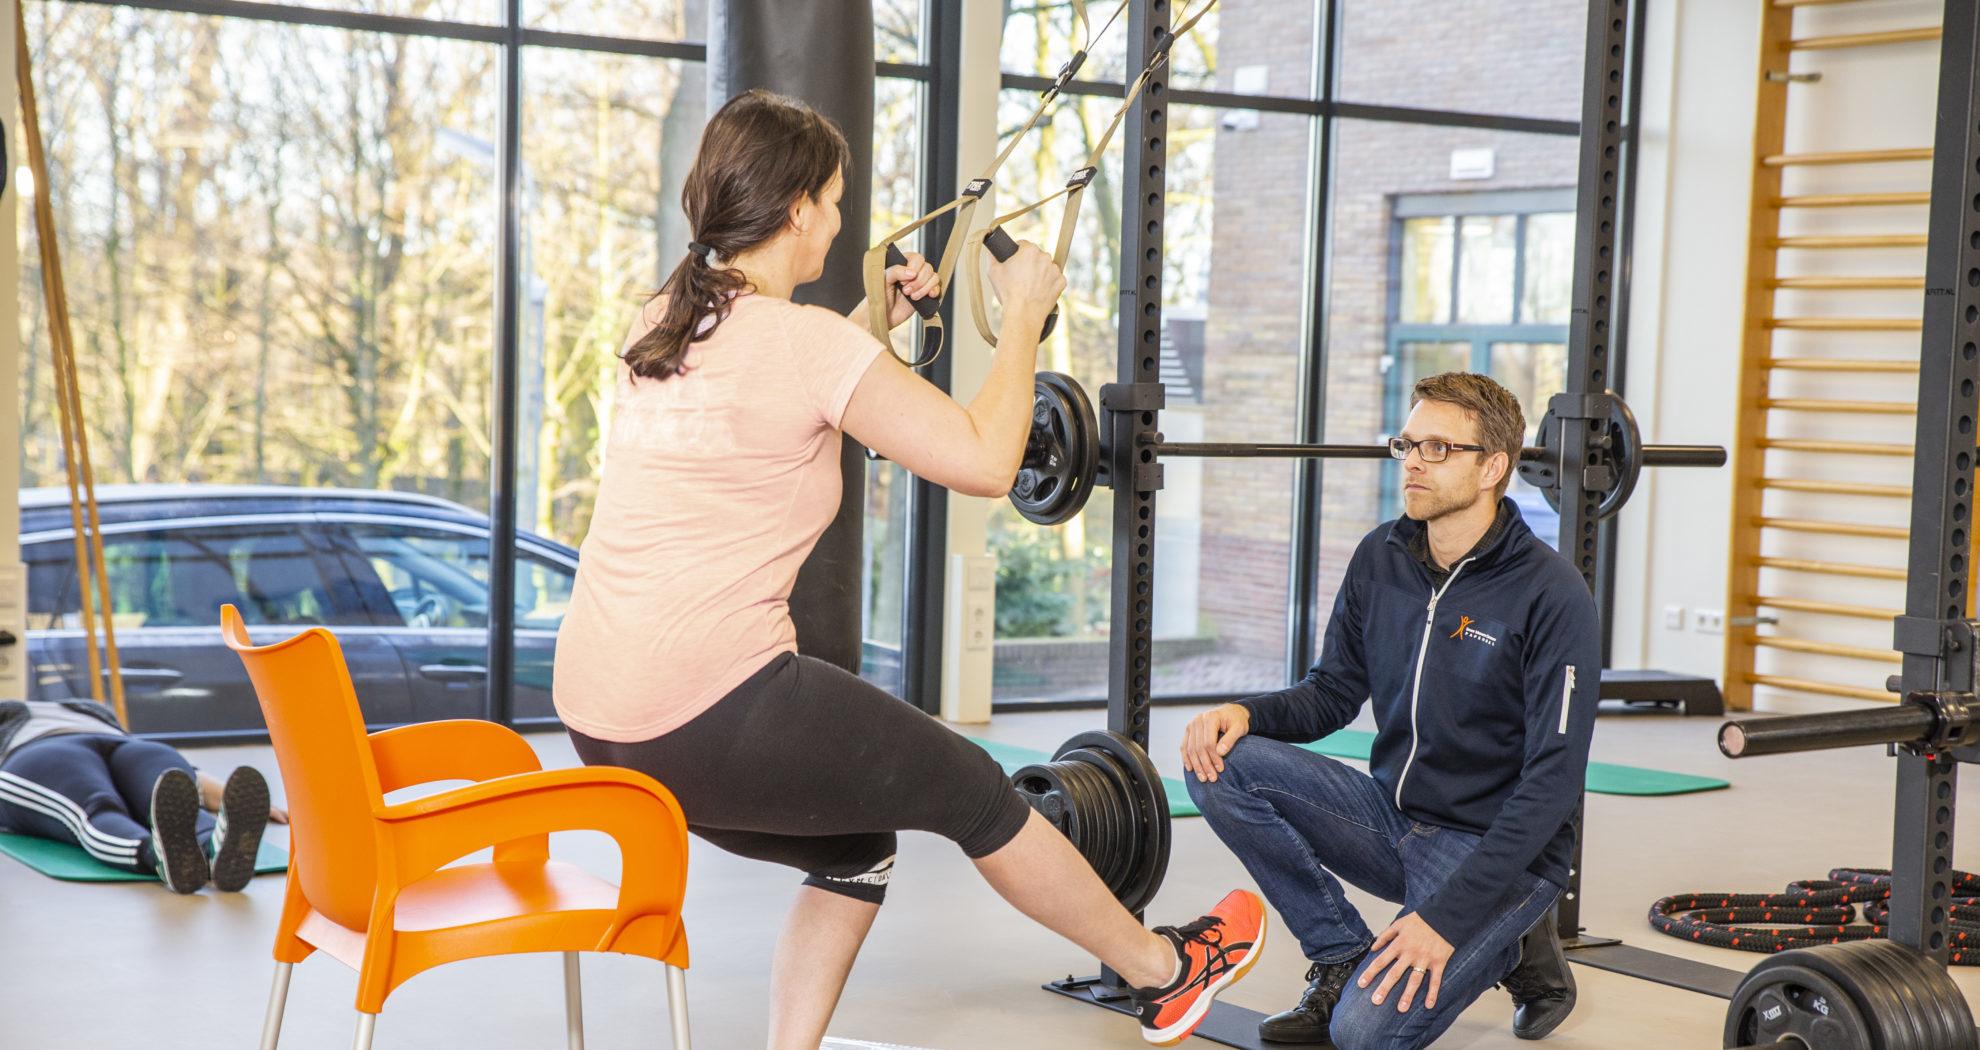 fysiotherapie-smcp 8